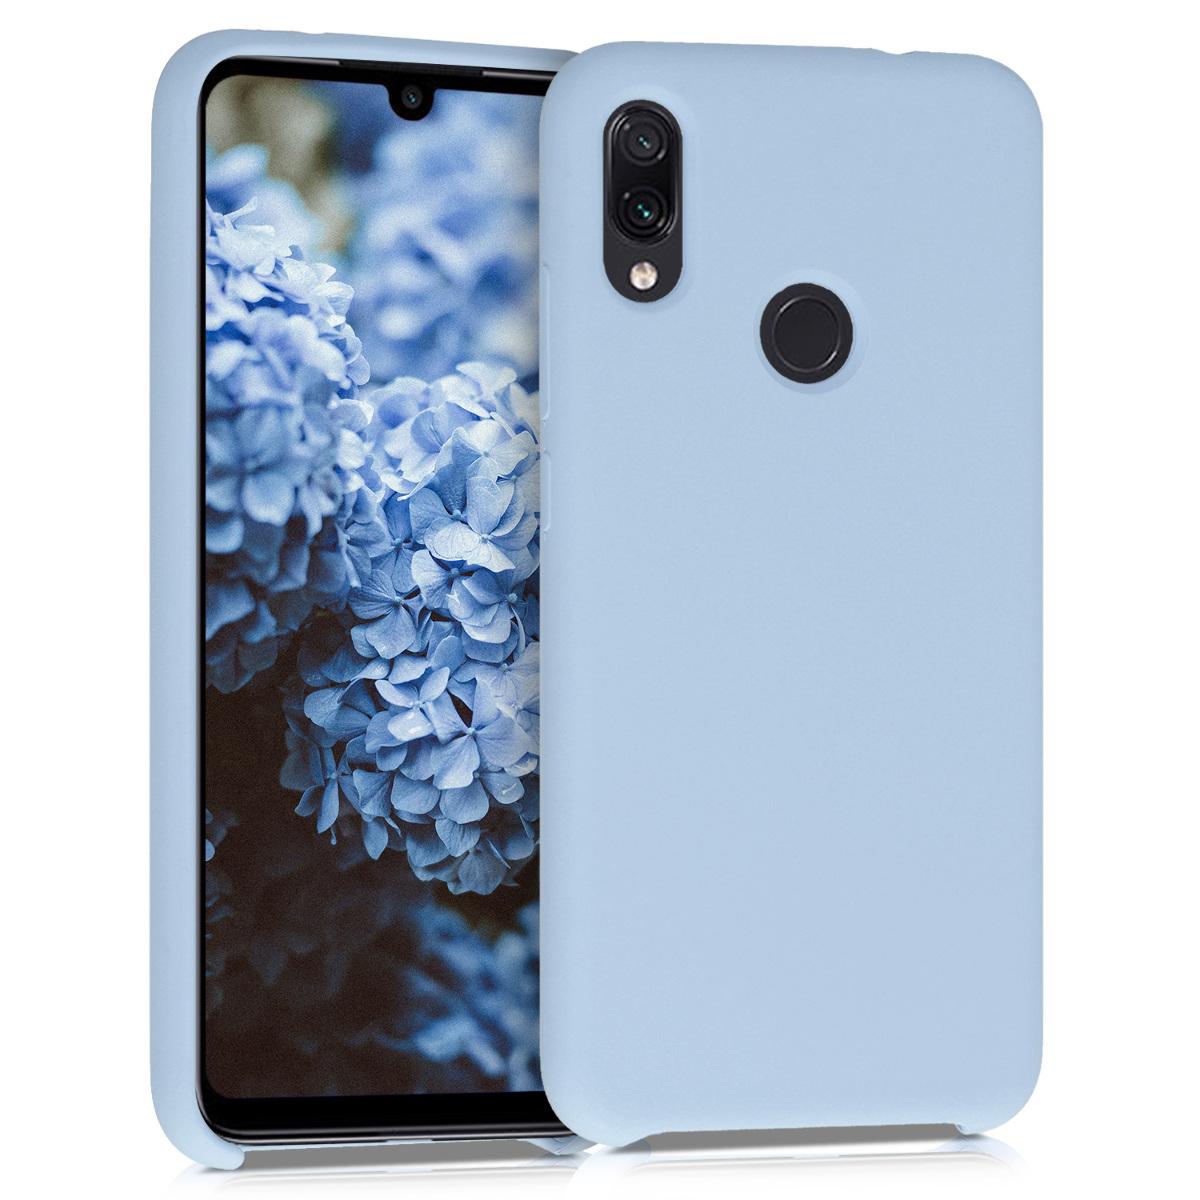 KW Θήκη Σιλικόνης Xiaomi Redmi Note 7 - Soft Flexible Rubber-  Light Blue Matte (48714.58)